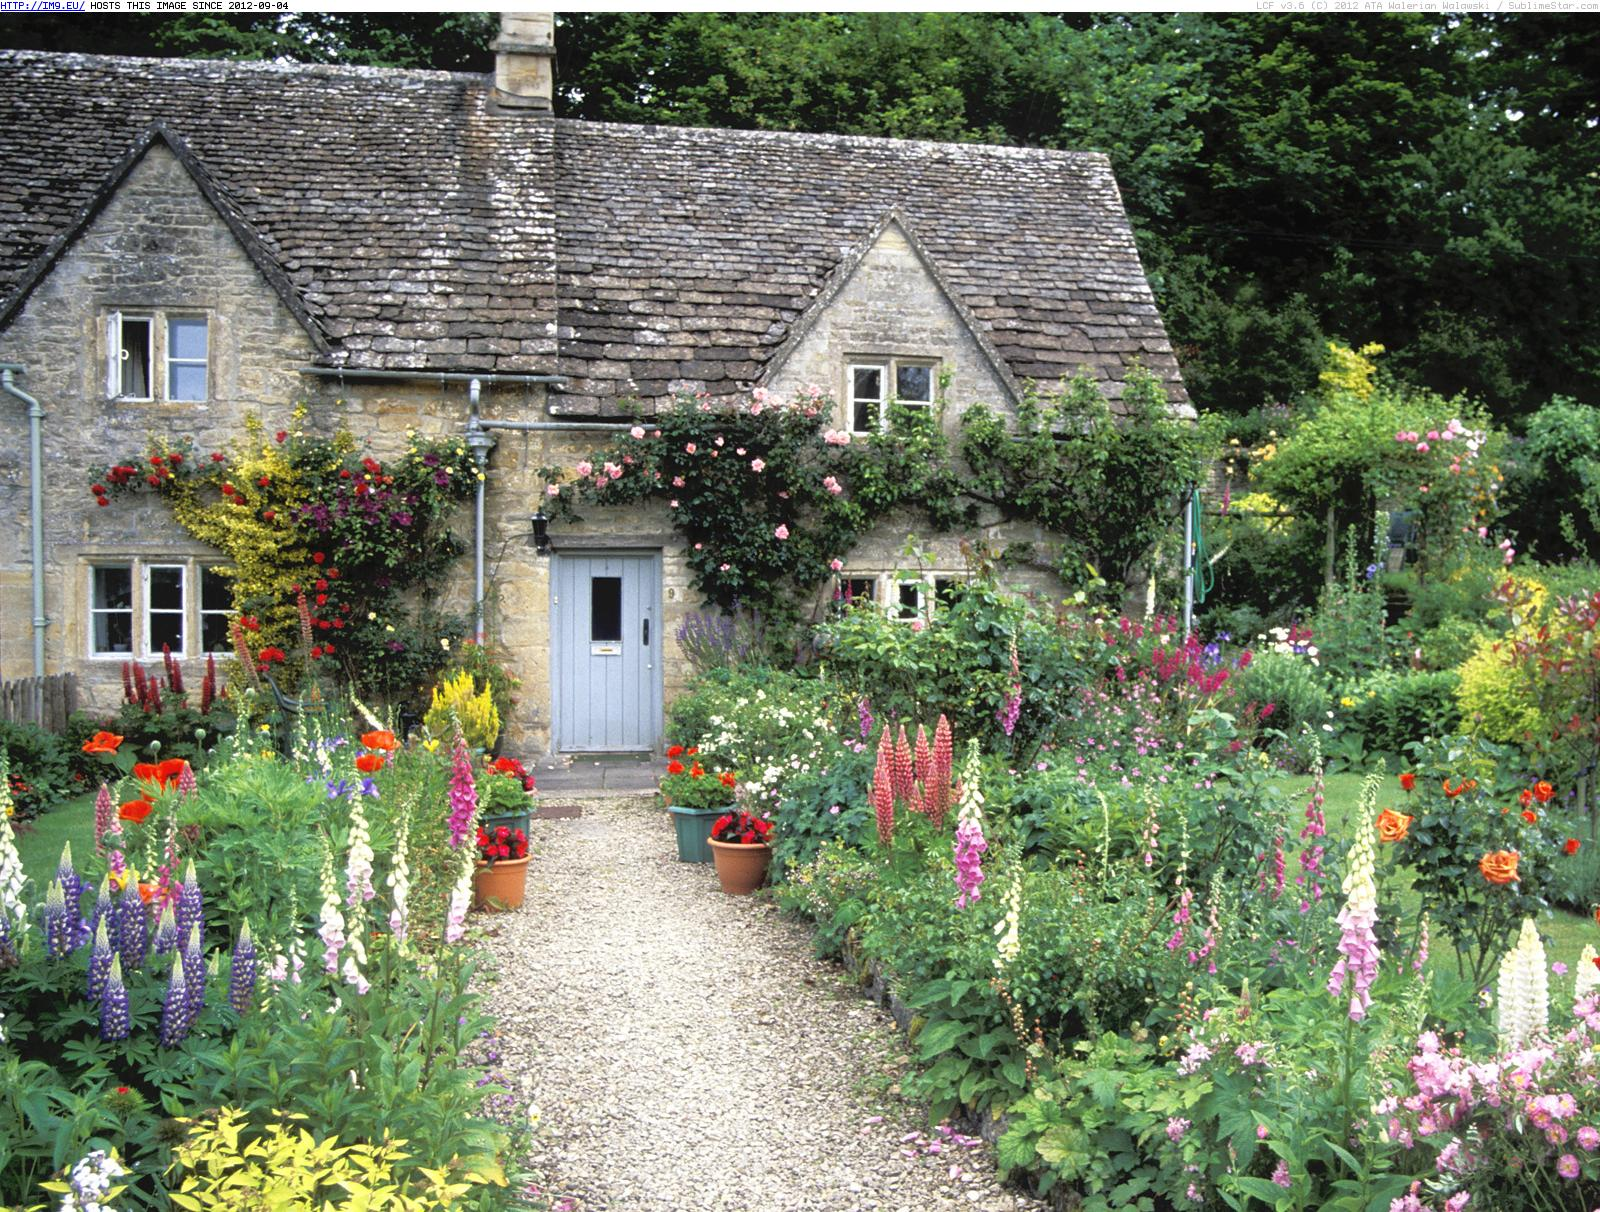 cottage-garden-bilbury-gloucestershire-england.jpg